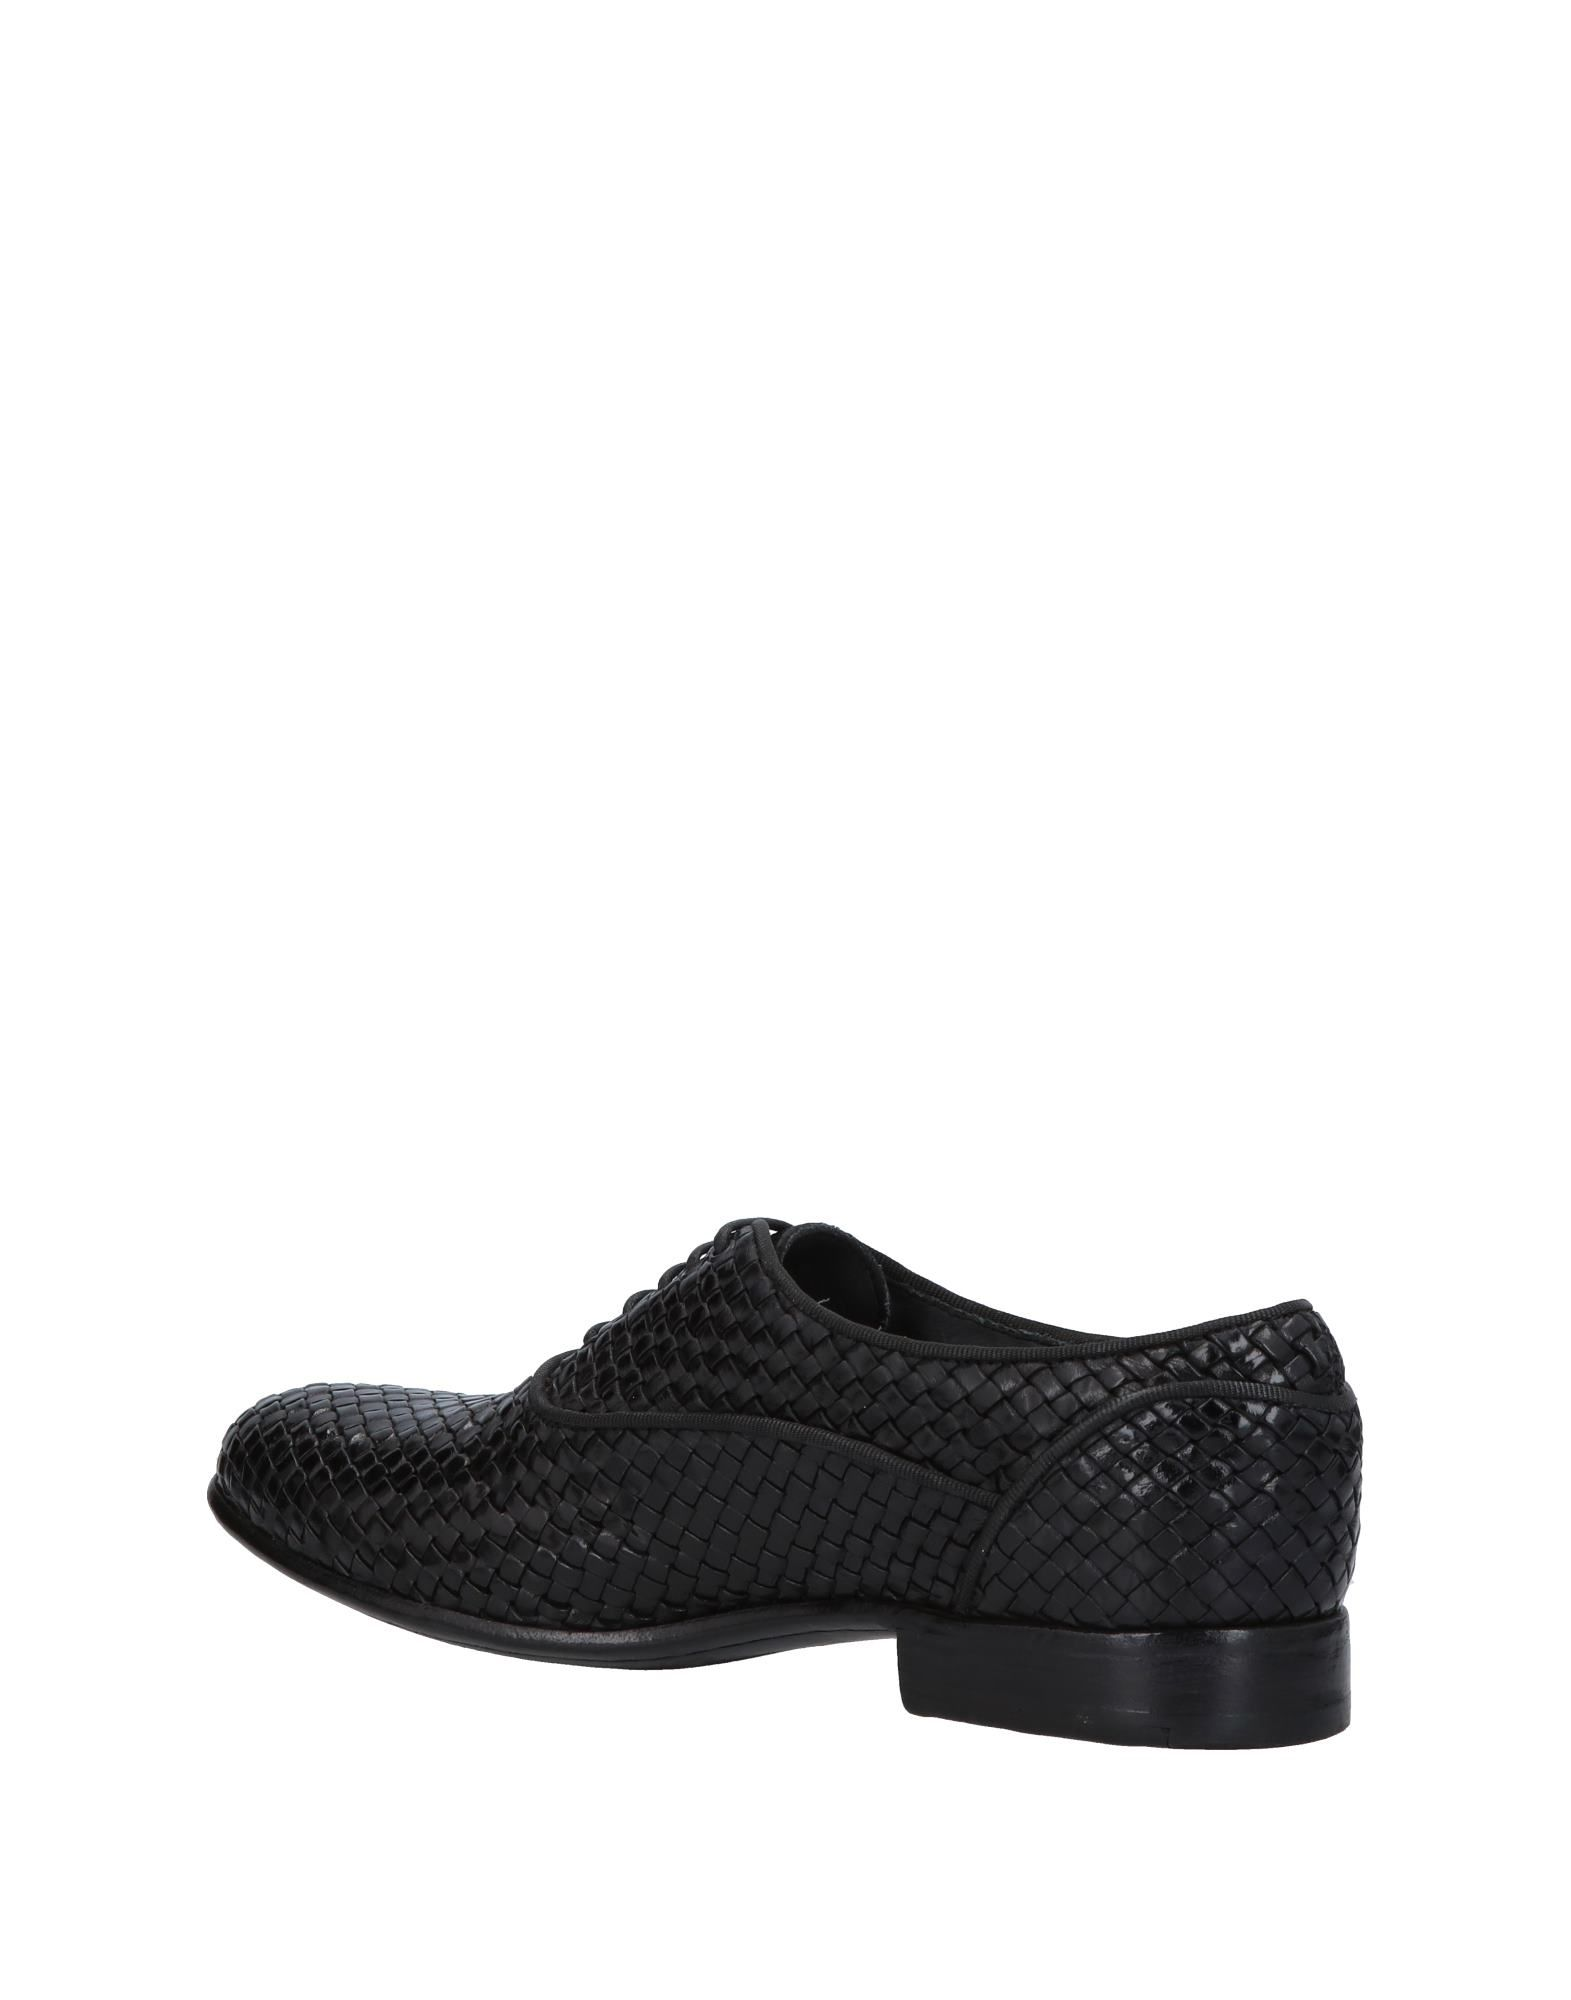 Alberto  Fasciani Schnürschuhe Damen  Alberto 11385786CRGut aussehende strapazierfähige Schuhe c07ffe